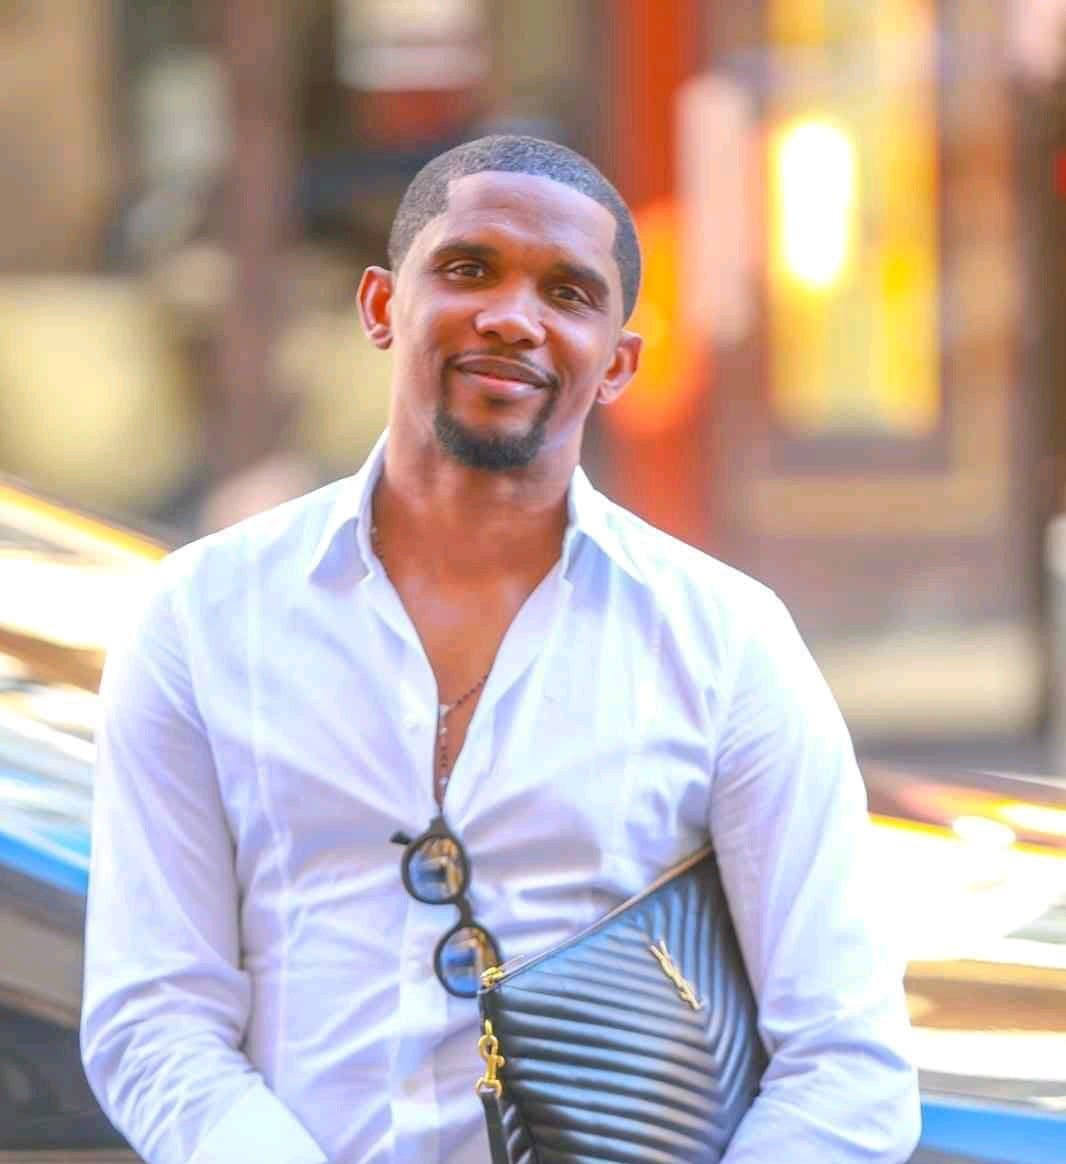 Samuel Eto'o change radicalement de look et embrase la toile